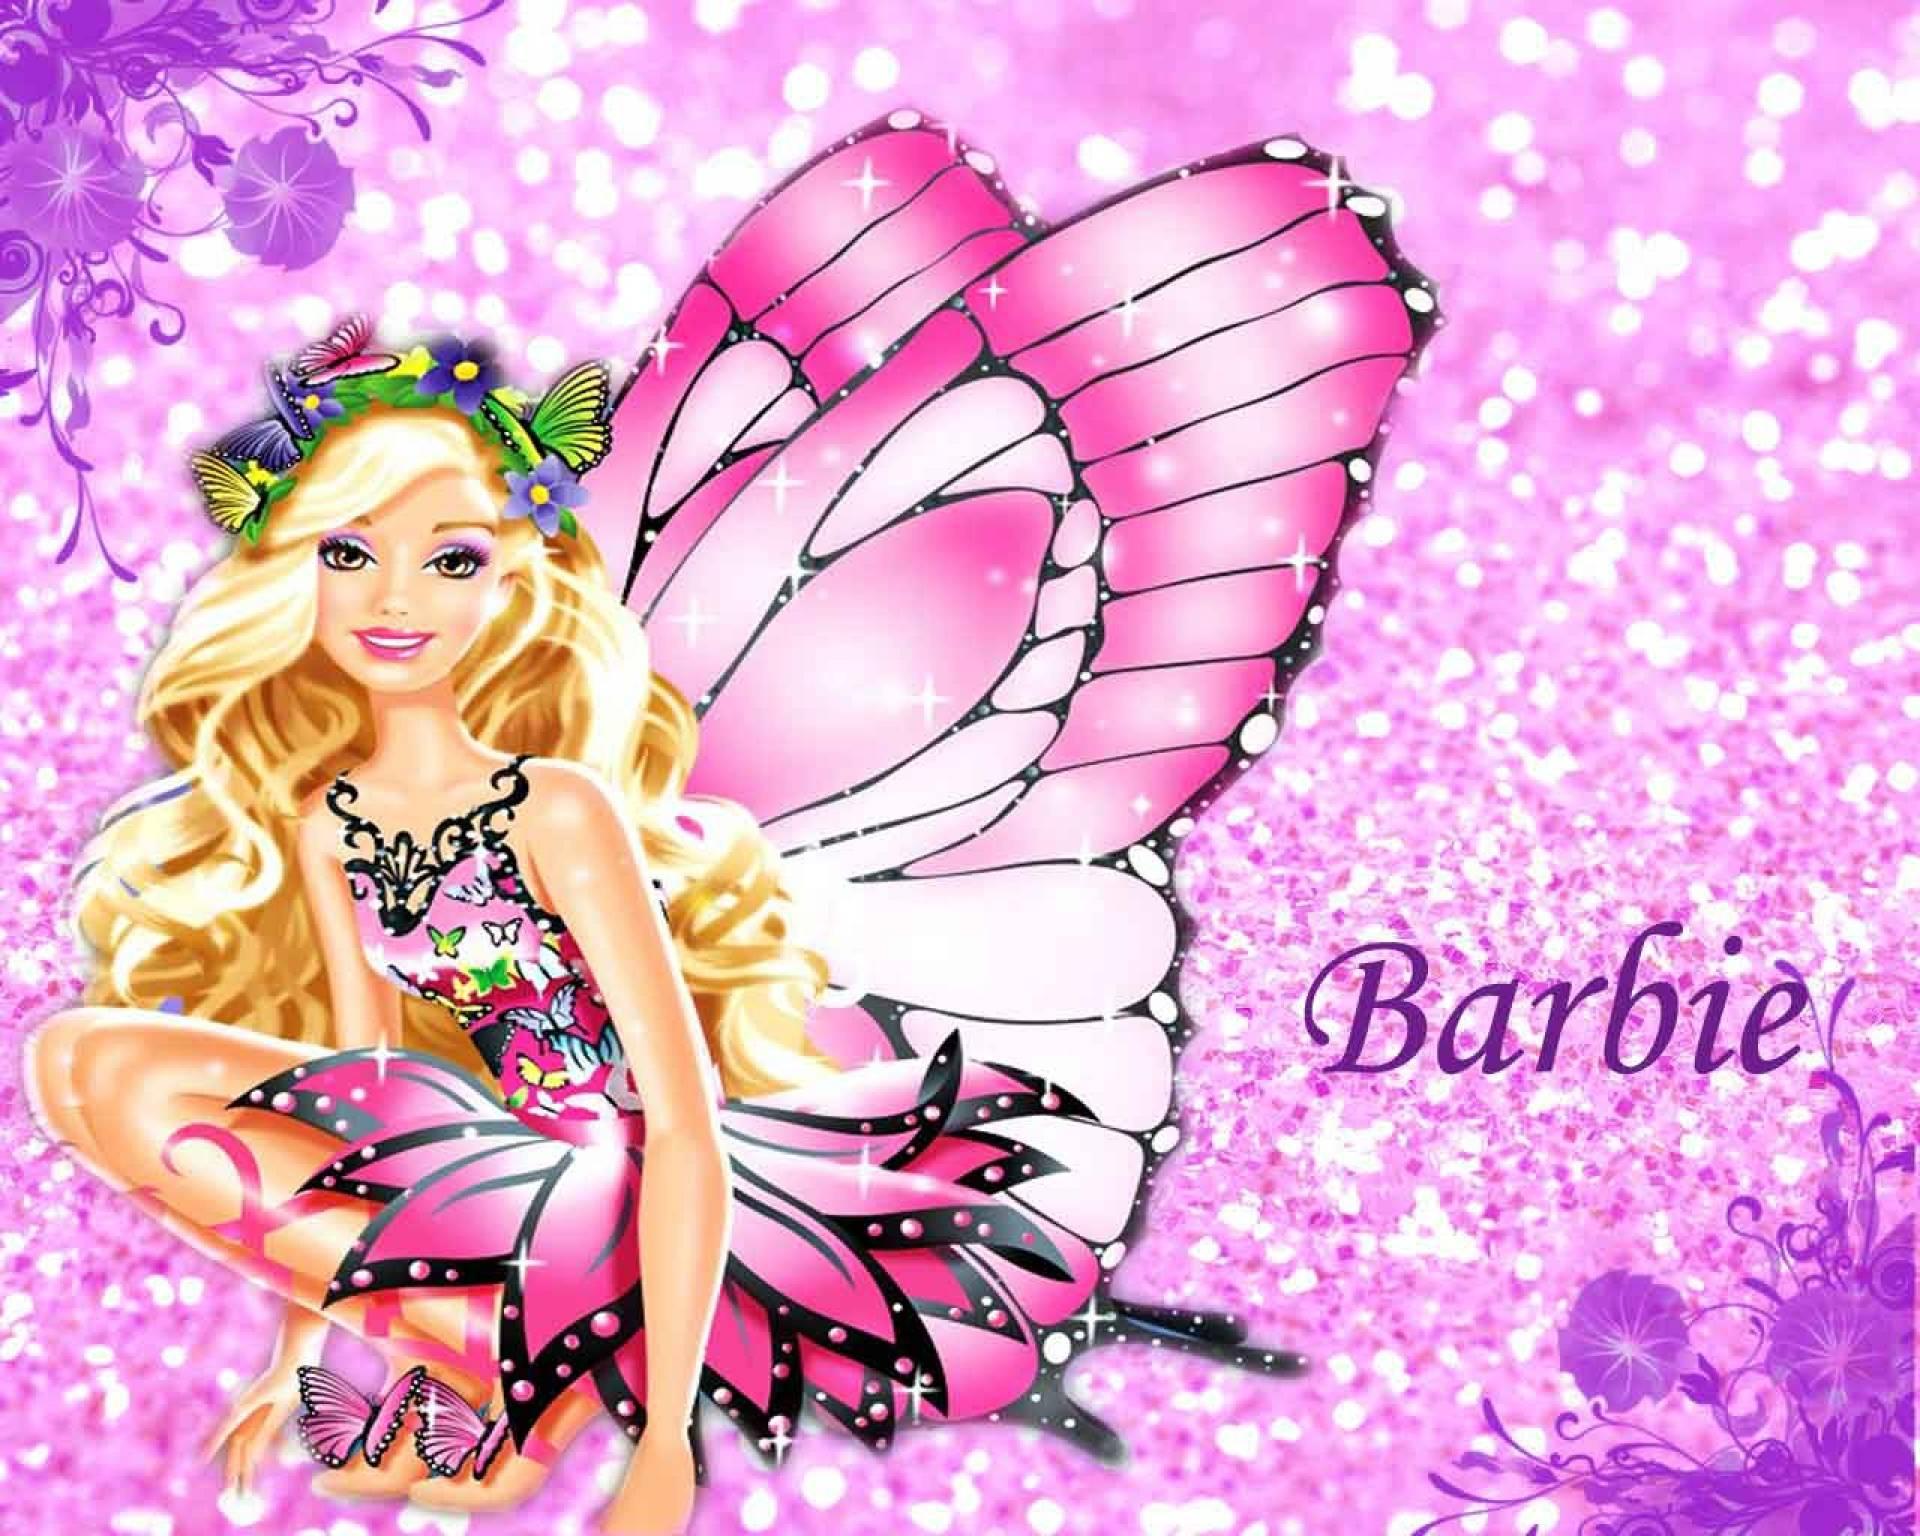 barbie graphics images